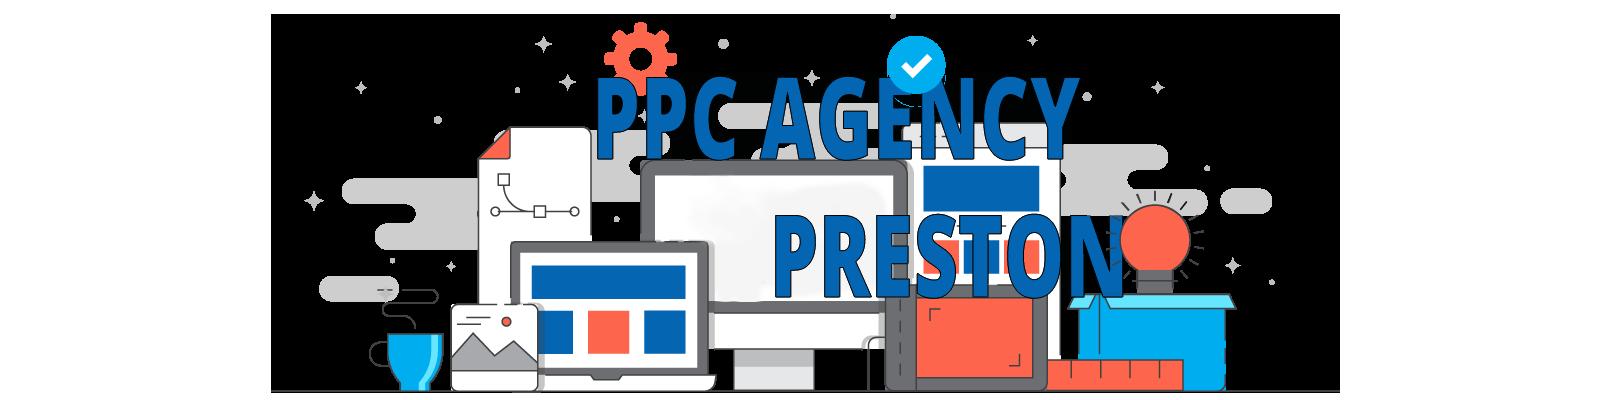 seek social ppc agency preston header with transparent background